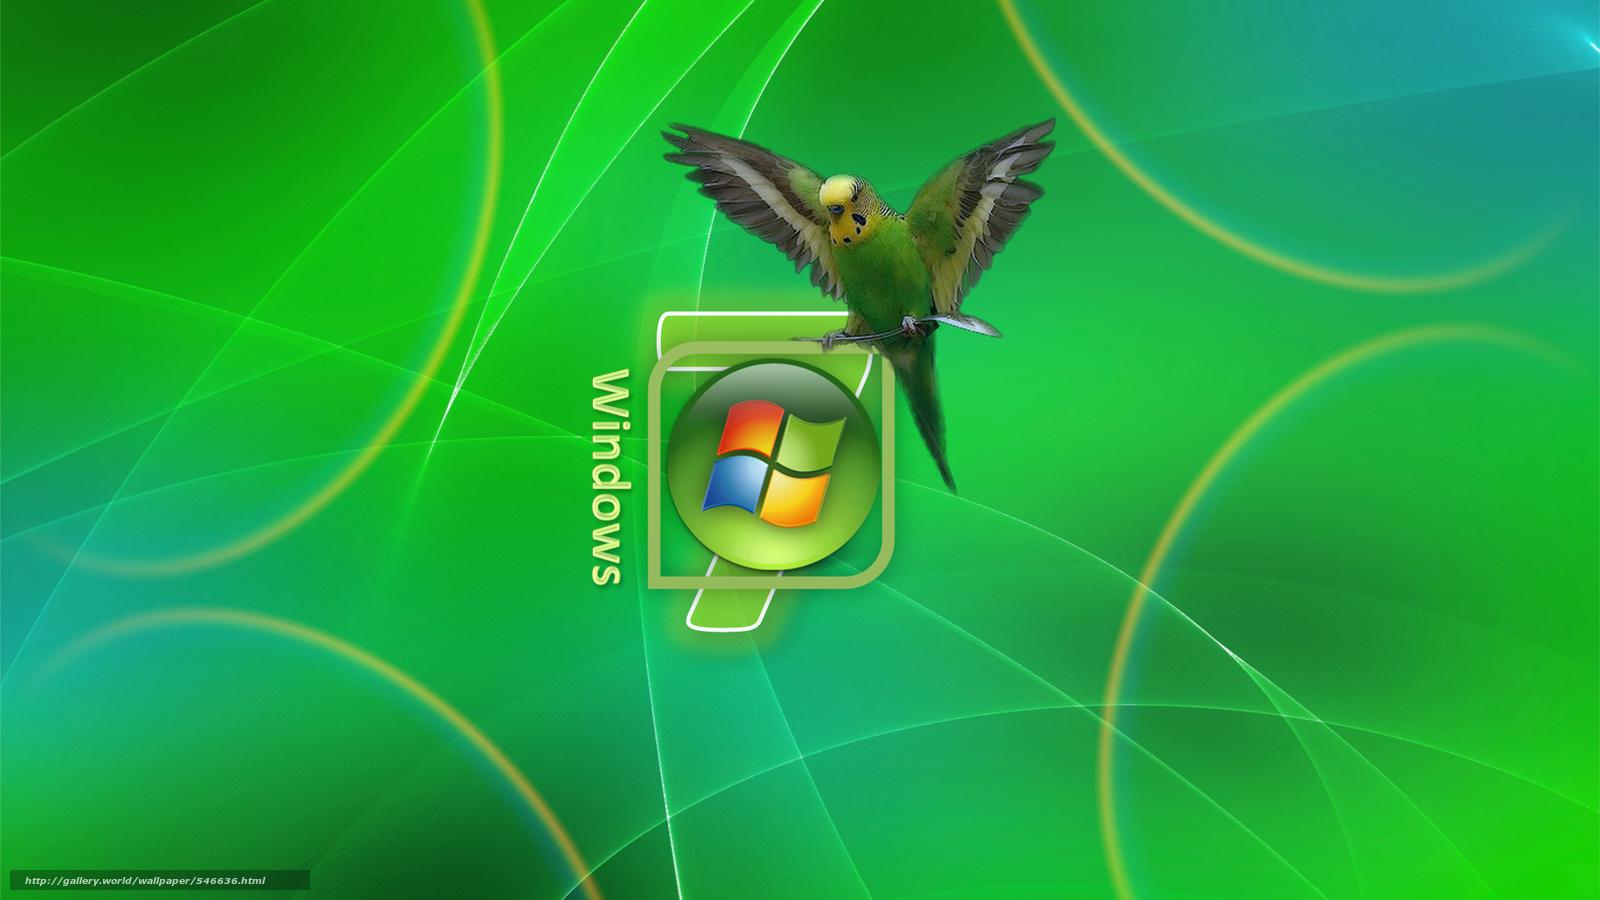 hd wallpapers for desktop windows 7